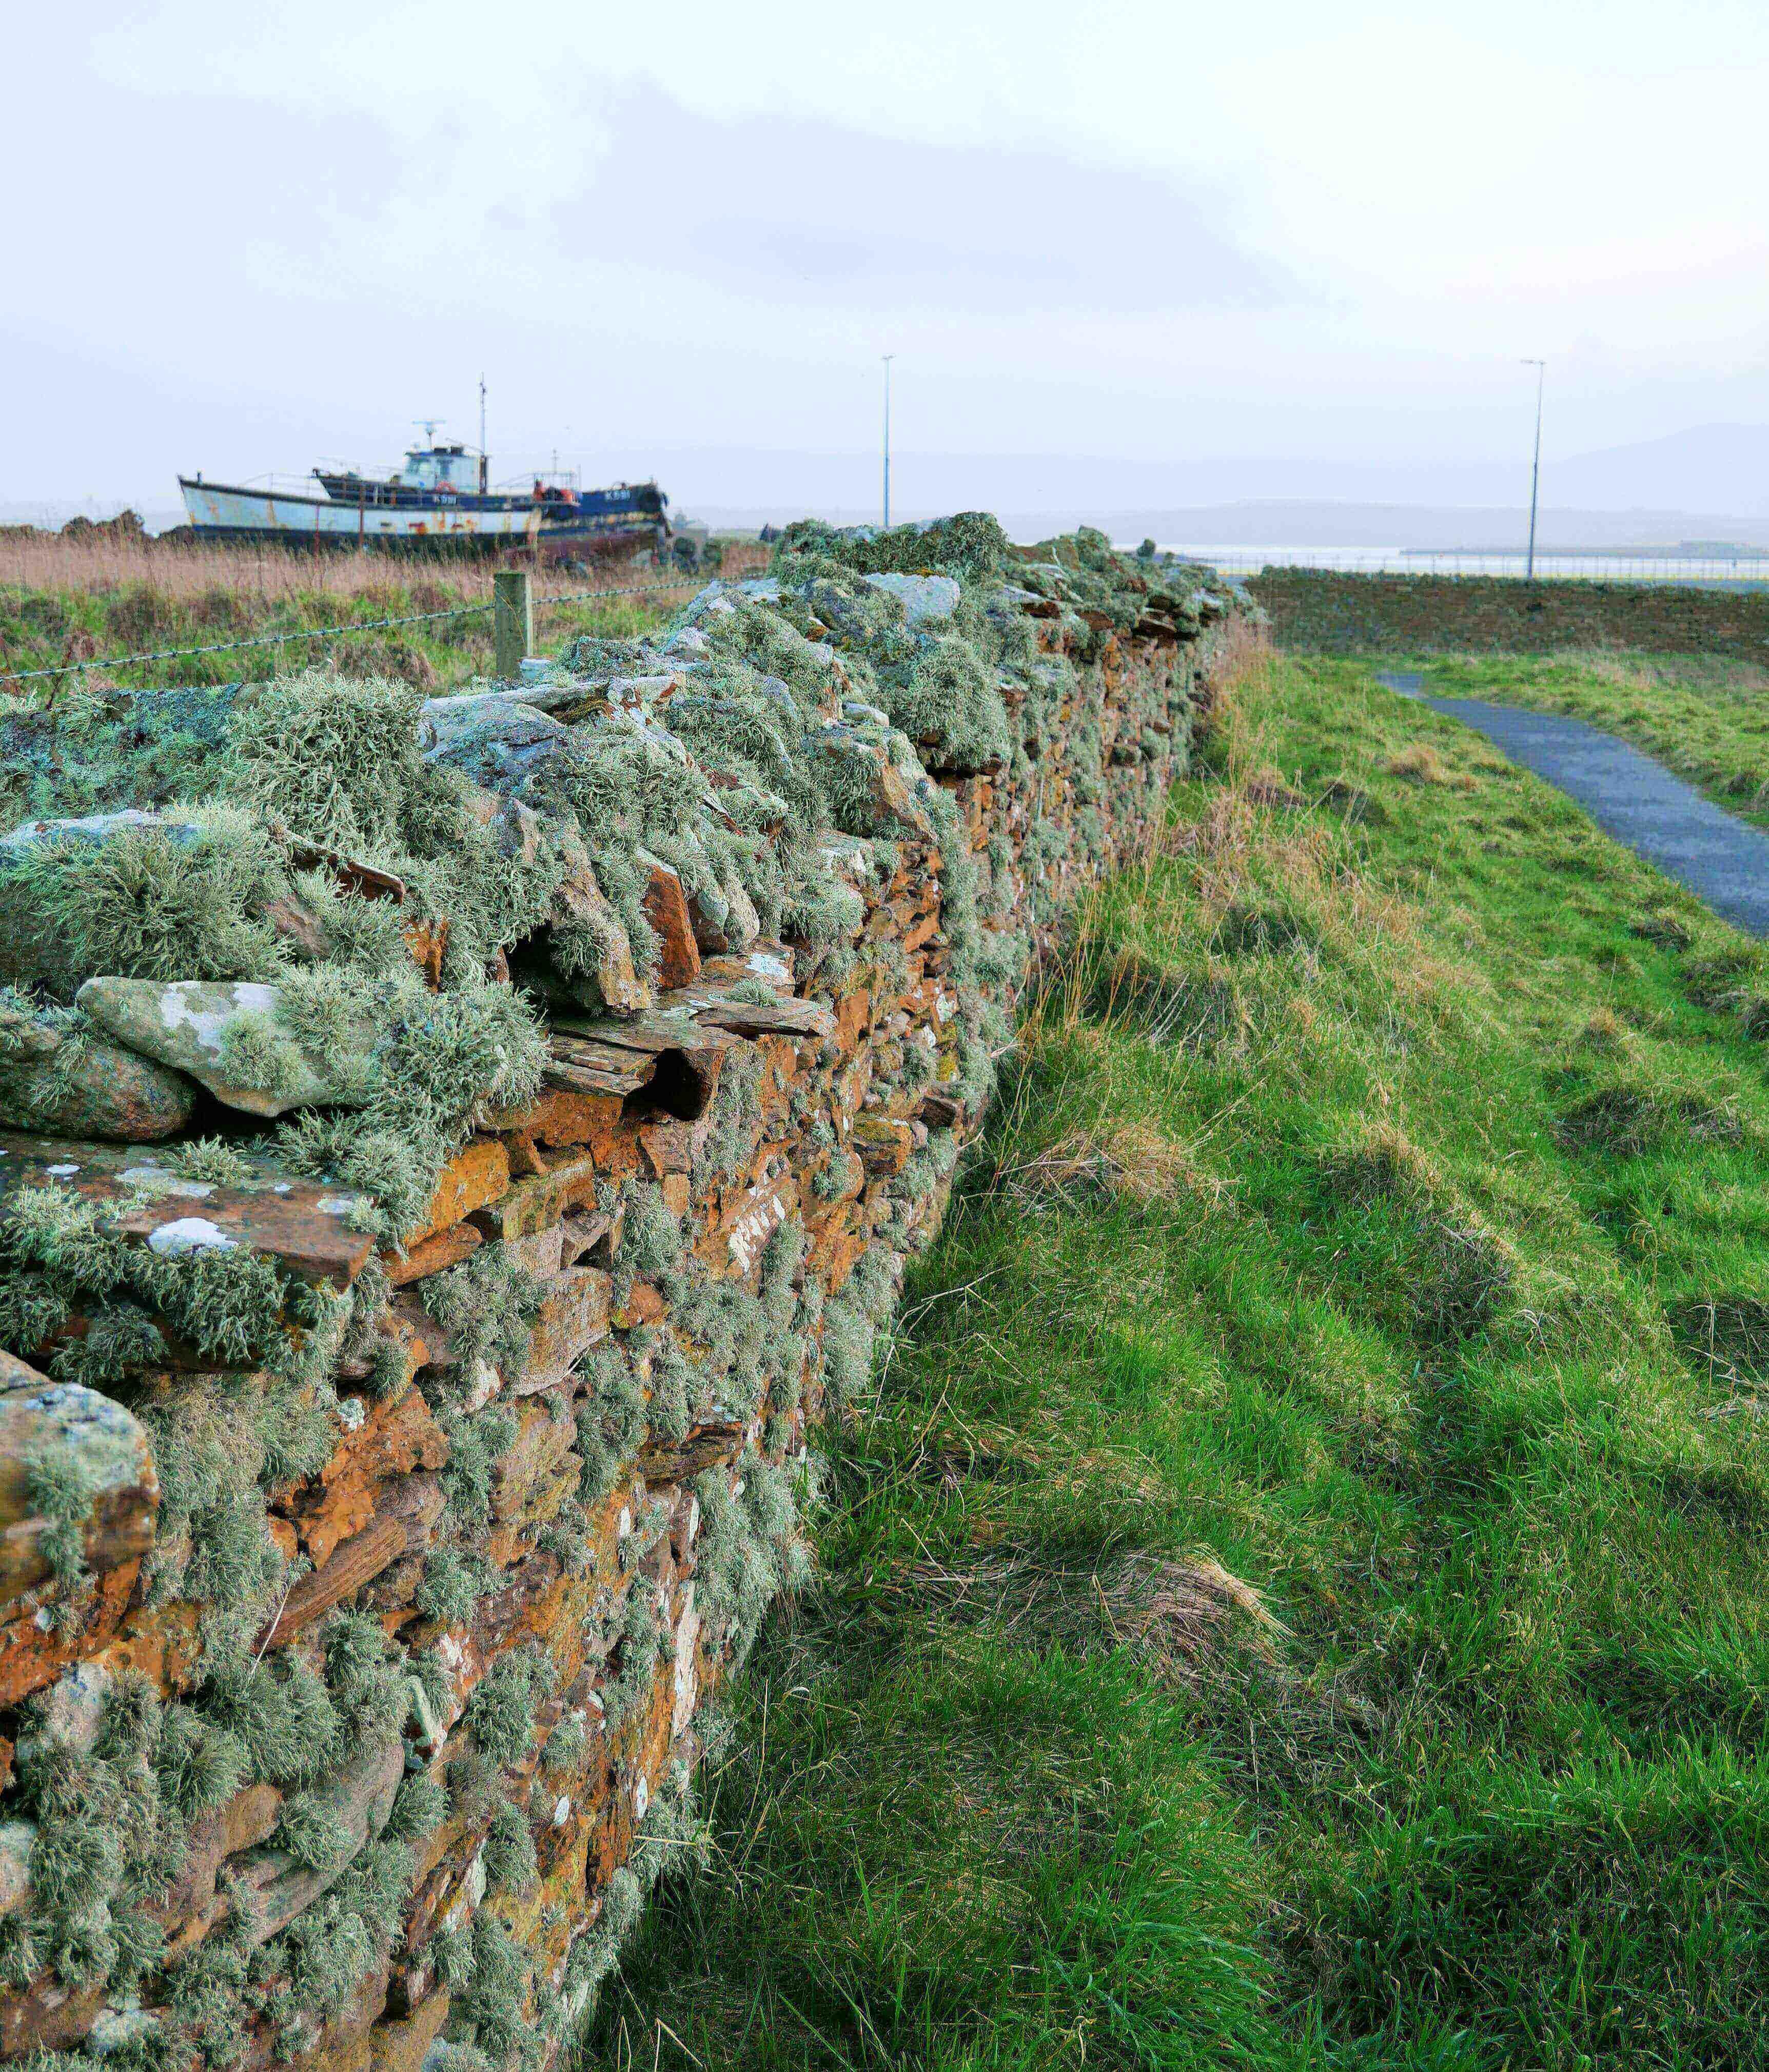 Walking path in Stromness, Orkney Islands, Scotland, UK - Orkneyology.com